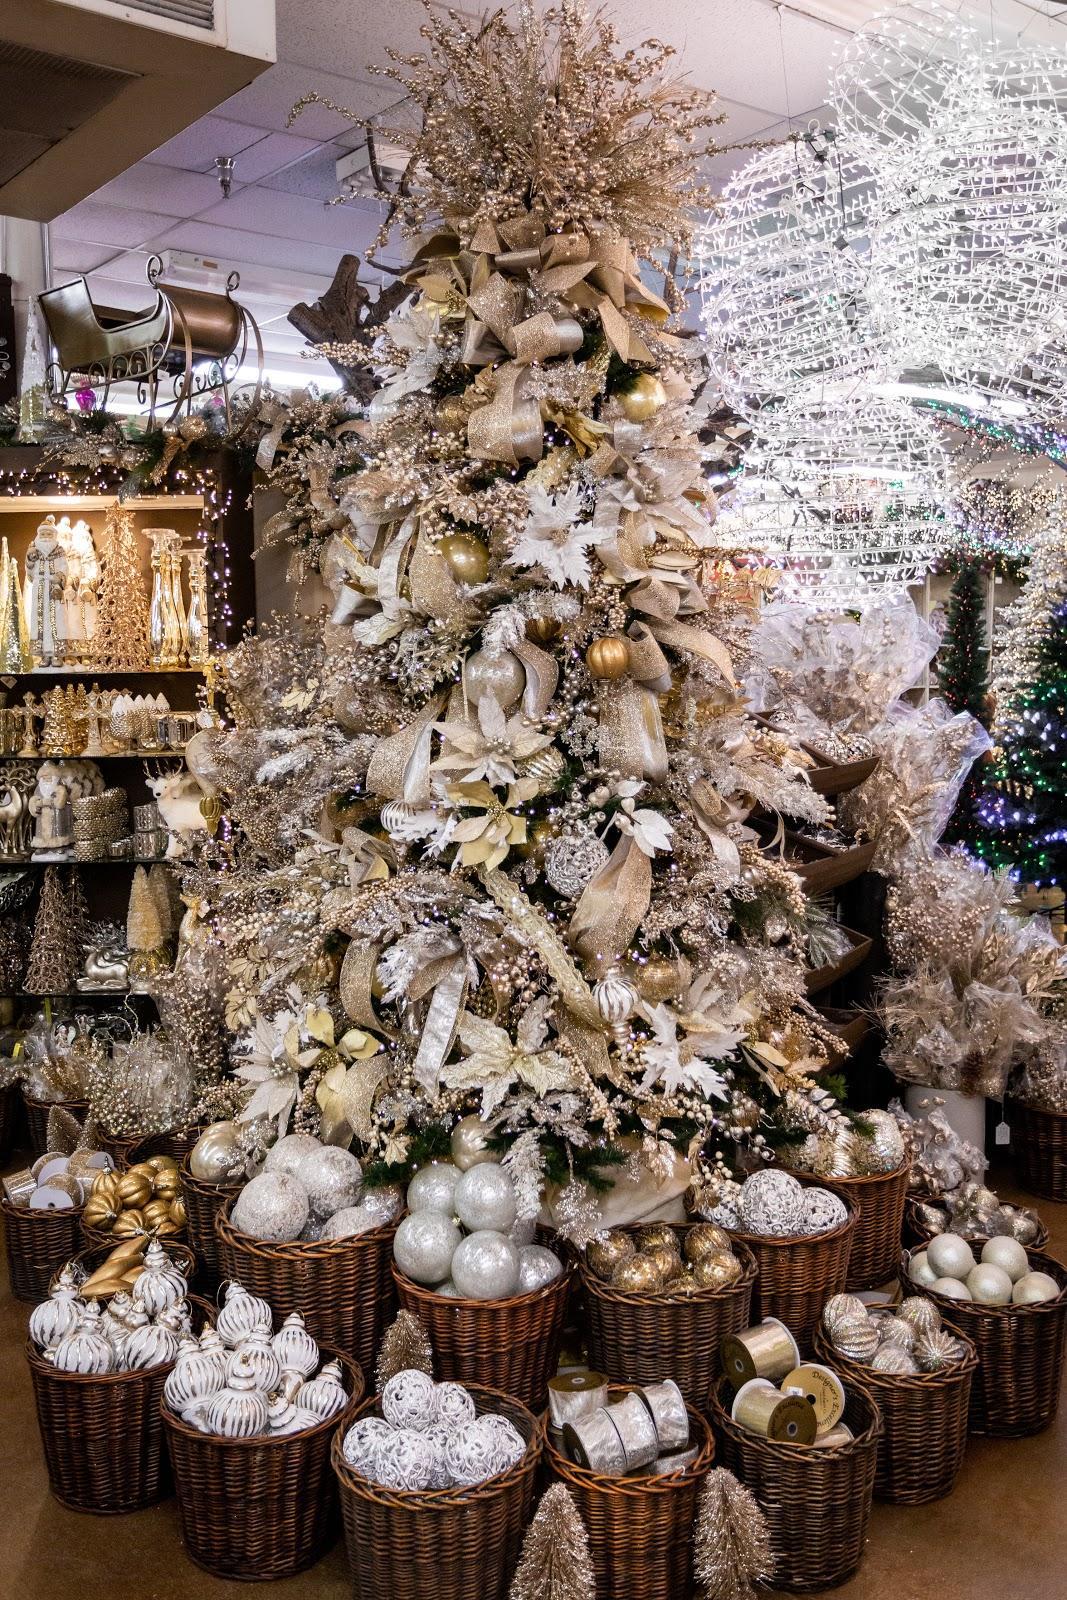 Christmas Decorating Trends 2020: χριστουγεννιάτικο δέντρο στολισμένο σε platinum αποχρώσεις